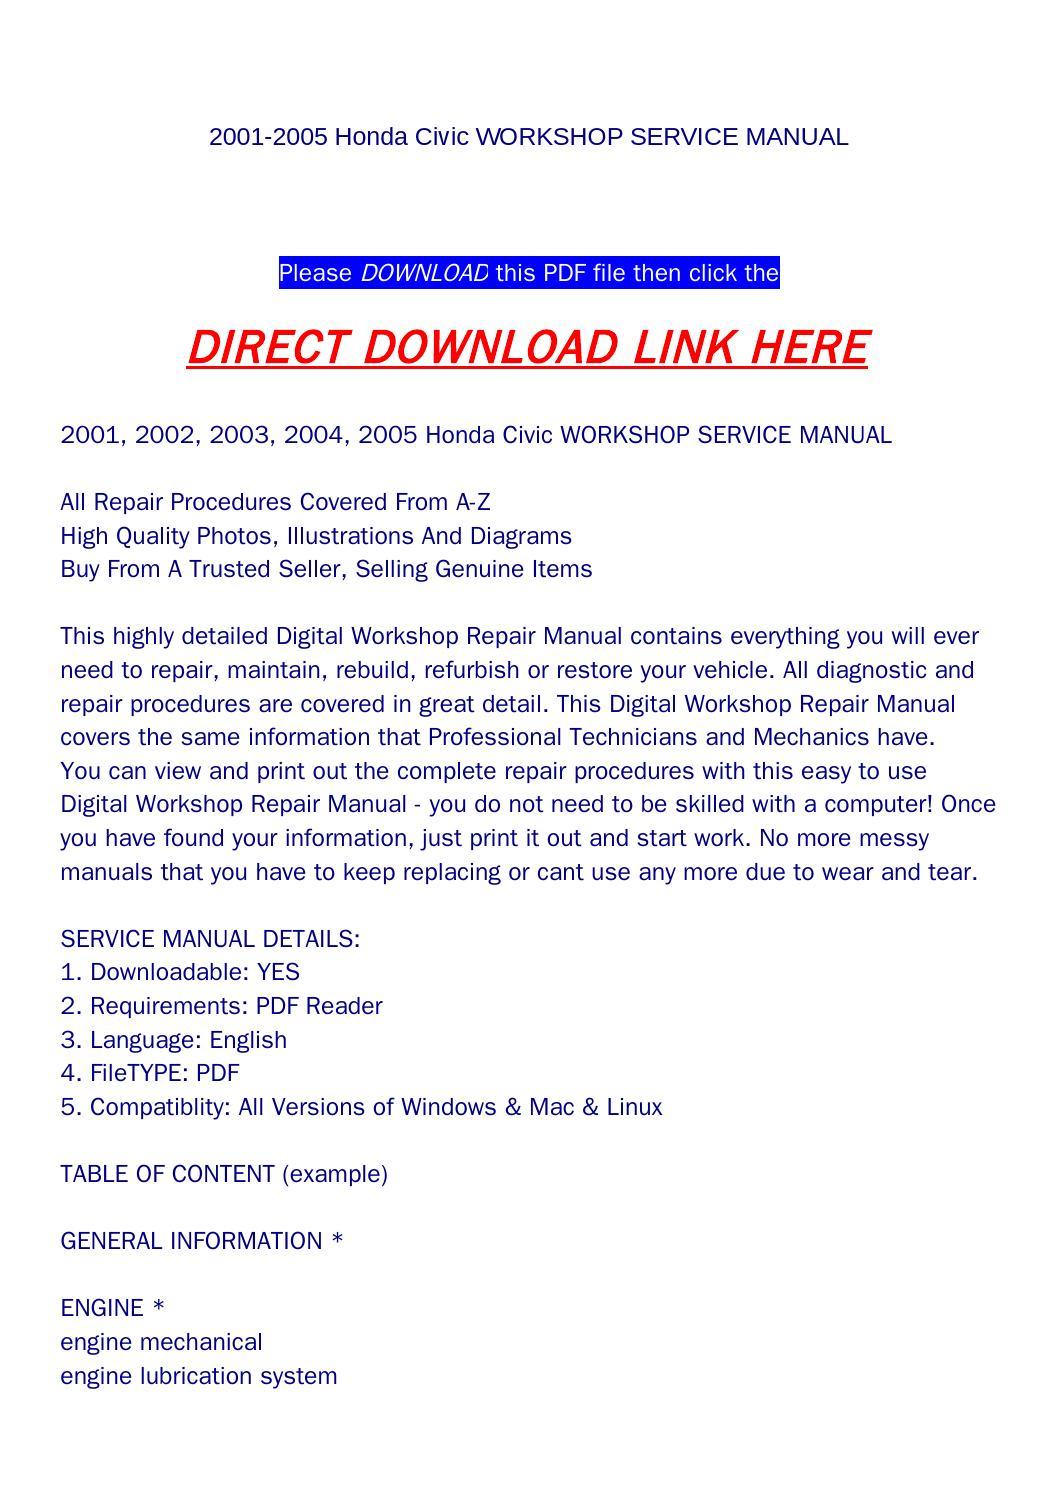 2005 honda civic service manual